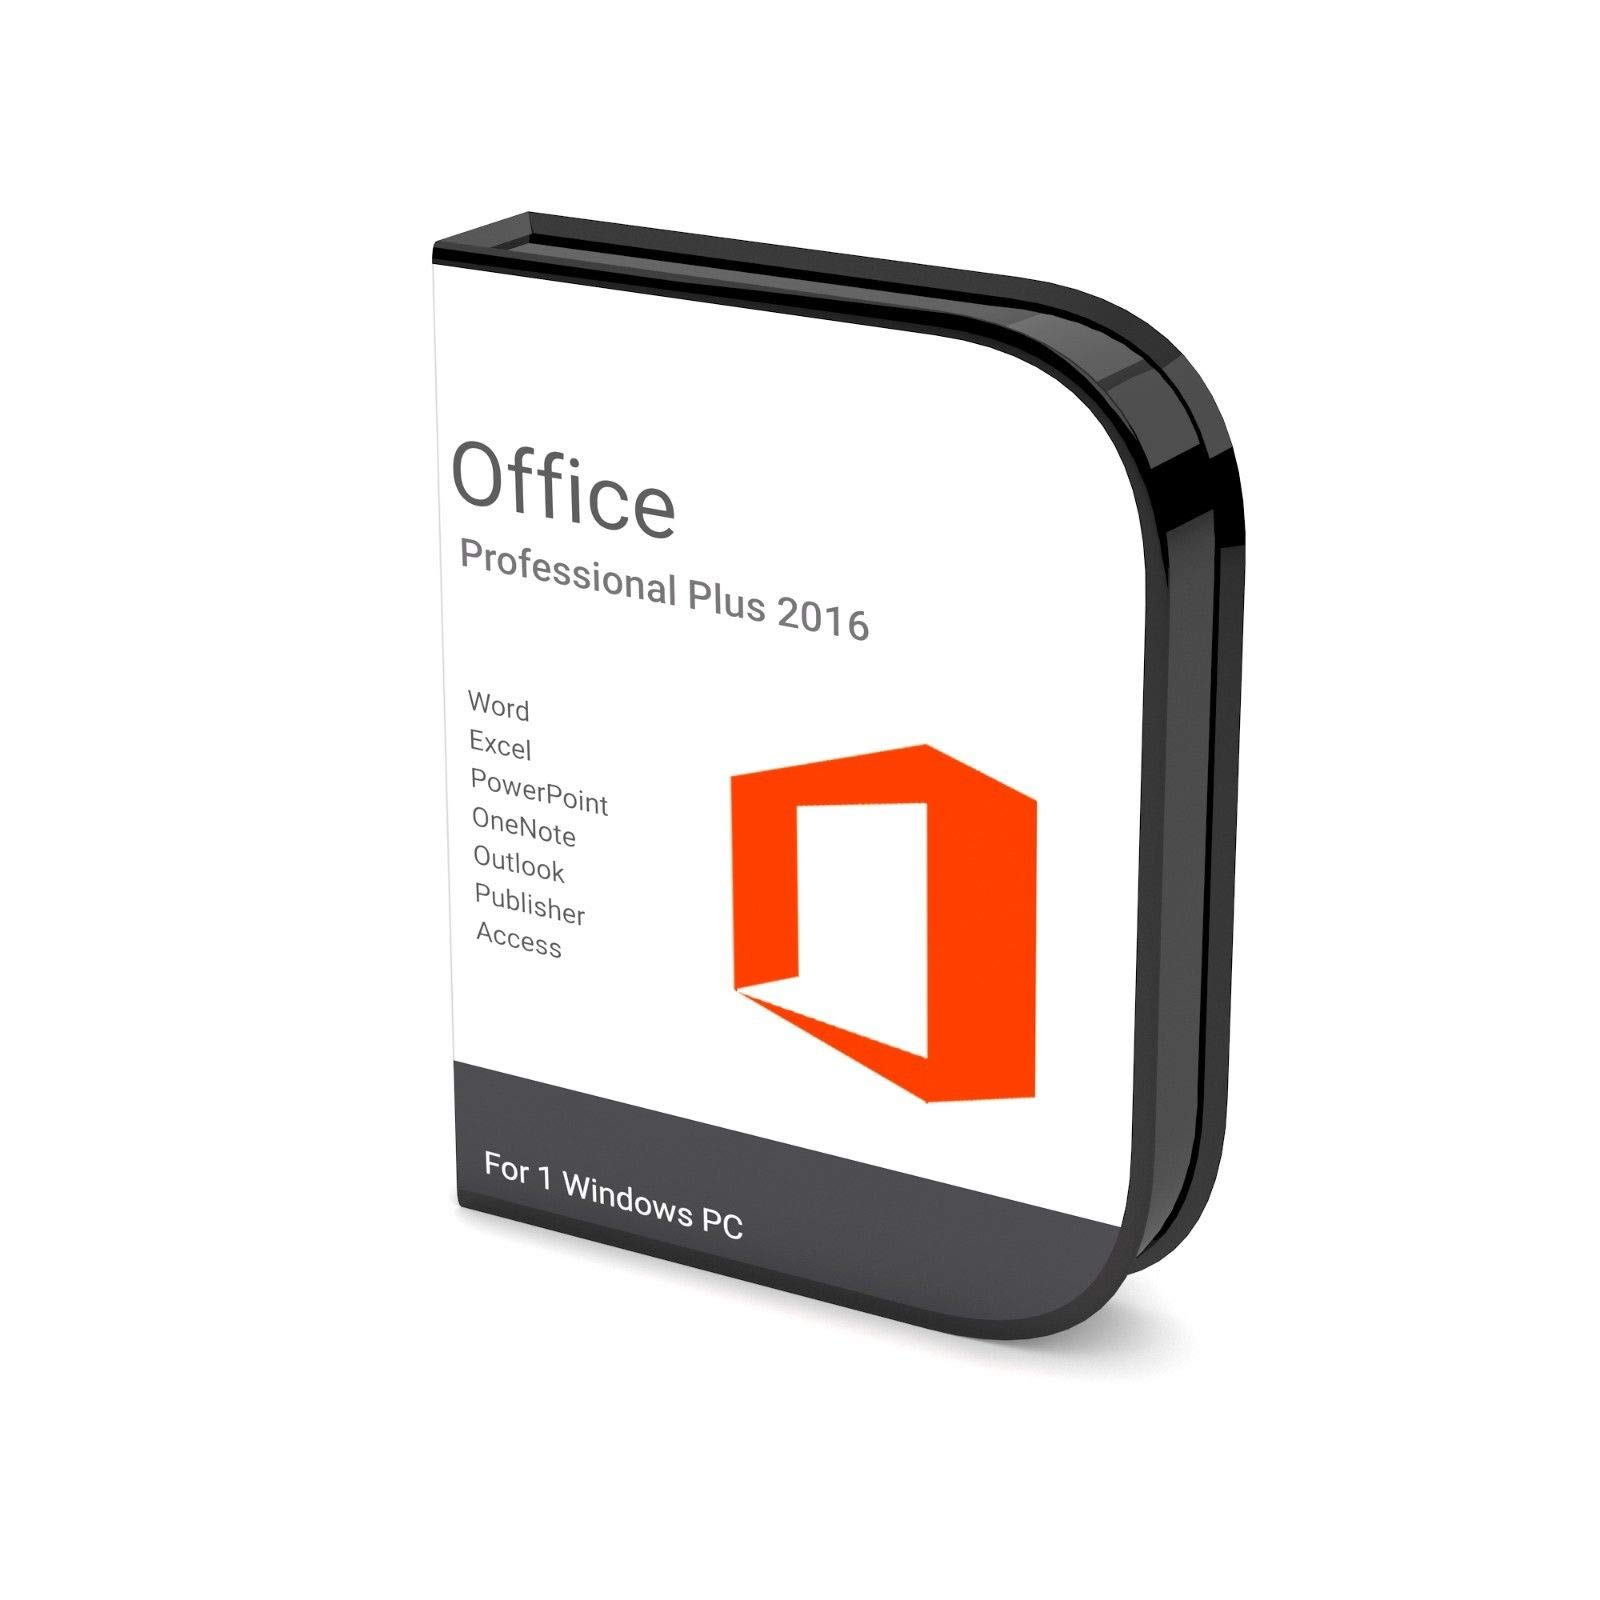 Microsoft Office 2016 Pro Plus 32-bit 64-bit Lifetime Product Key Download  Link